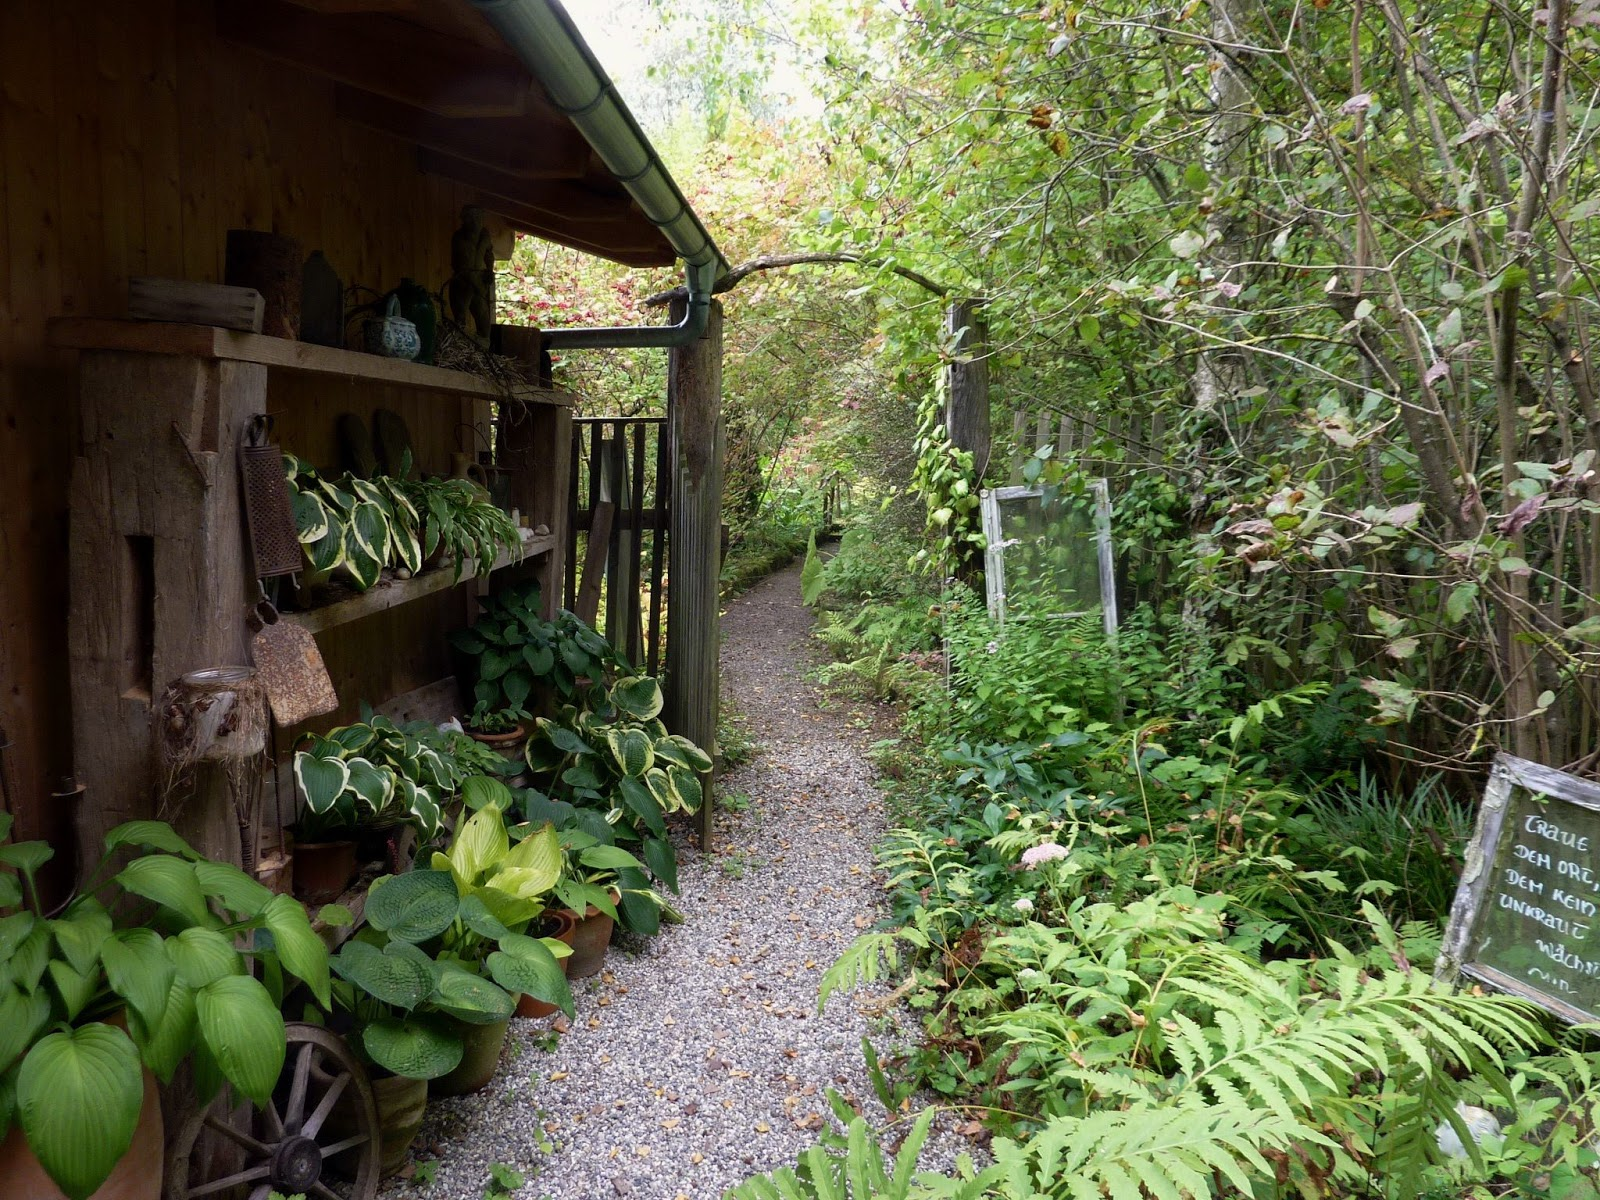 Le jardin de brigitte alsace le jardin hohenstein - Les jardins d alsace ...